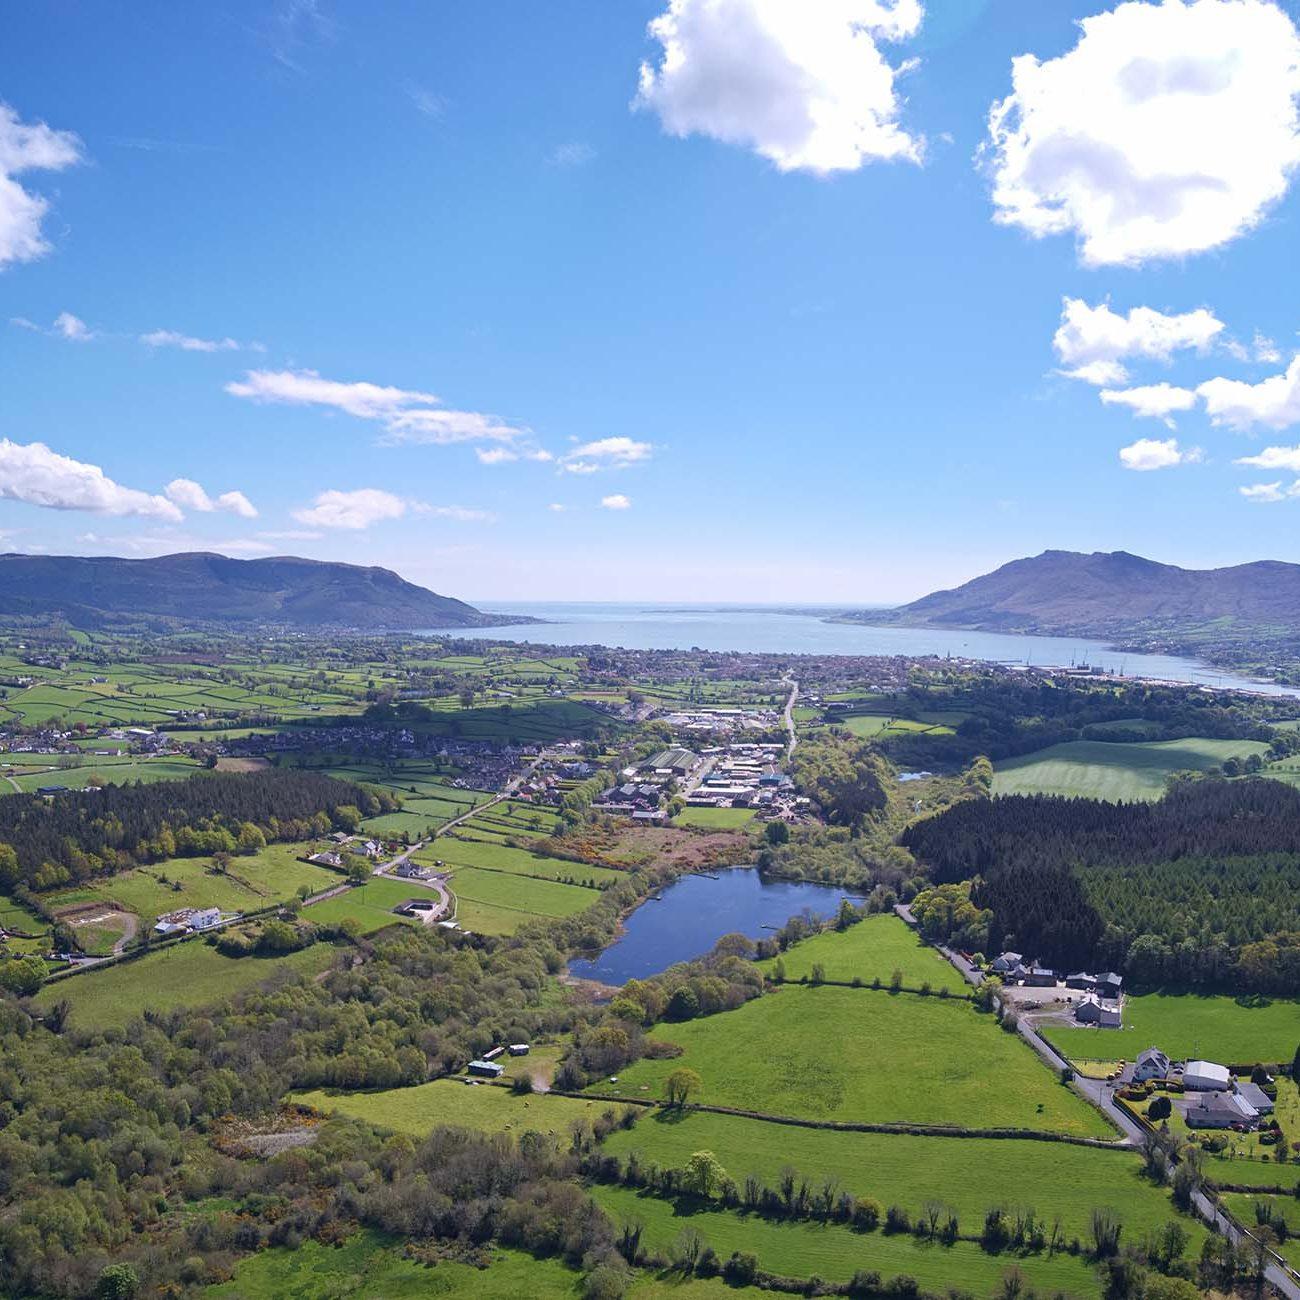 Grinan landscape in Bangor, NI